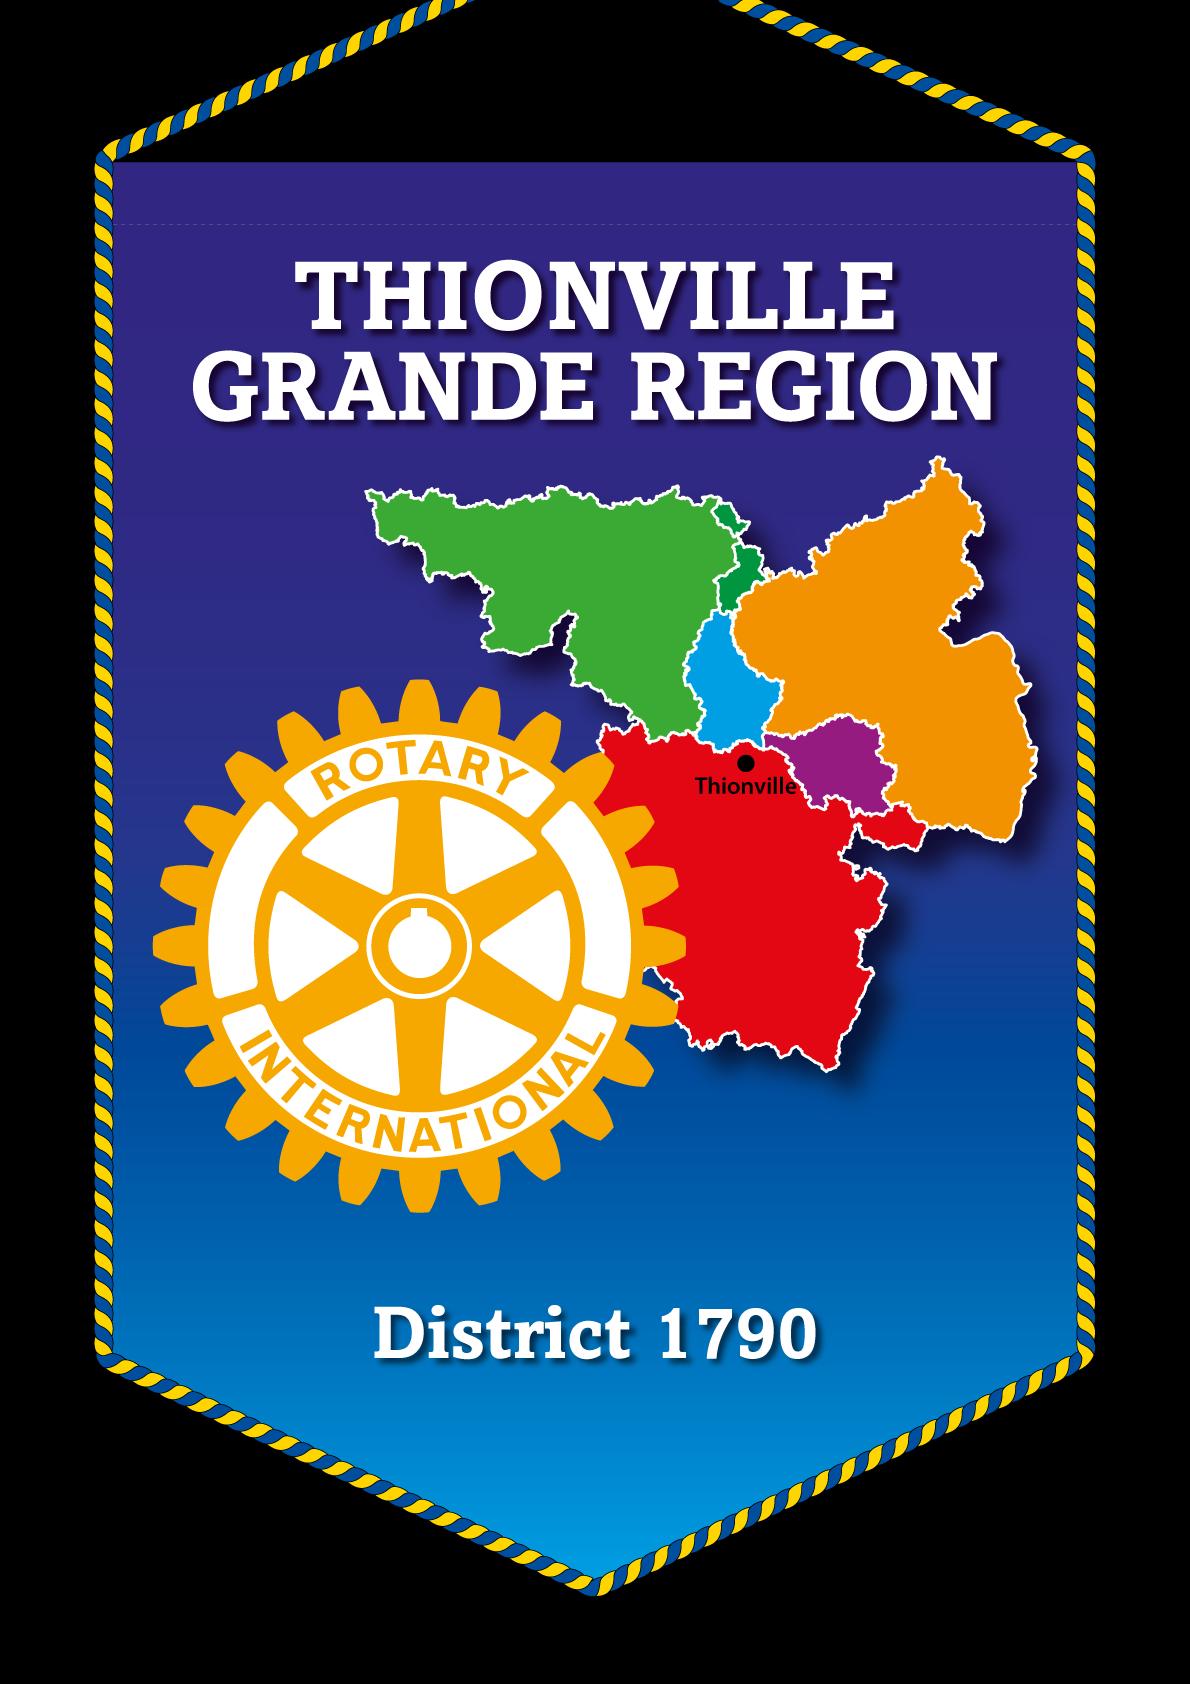 FANION ROTARY CLUB THIONVILLE GRANDE REGION